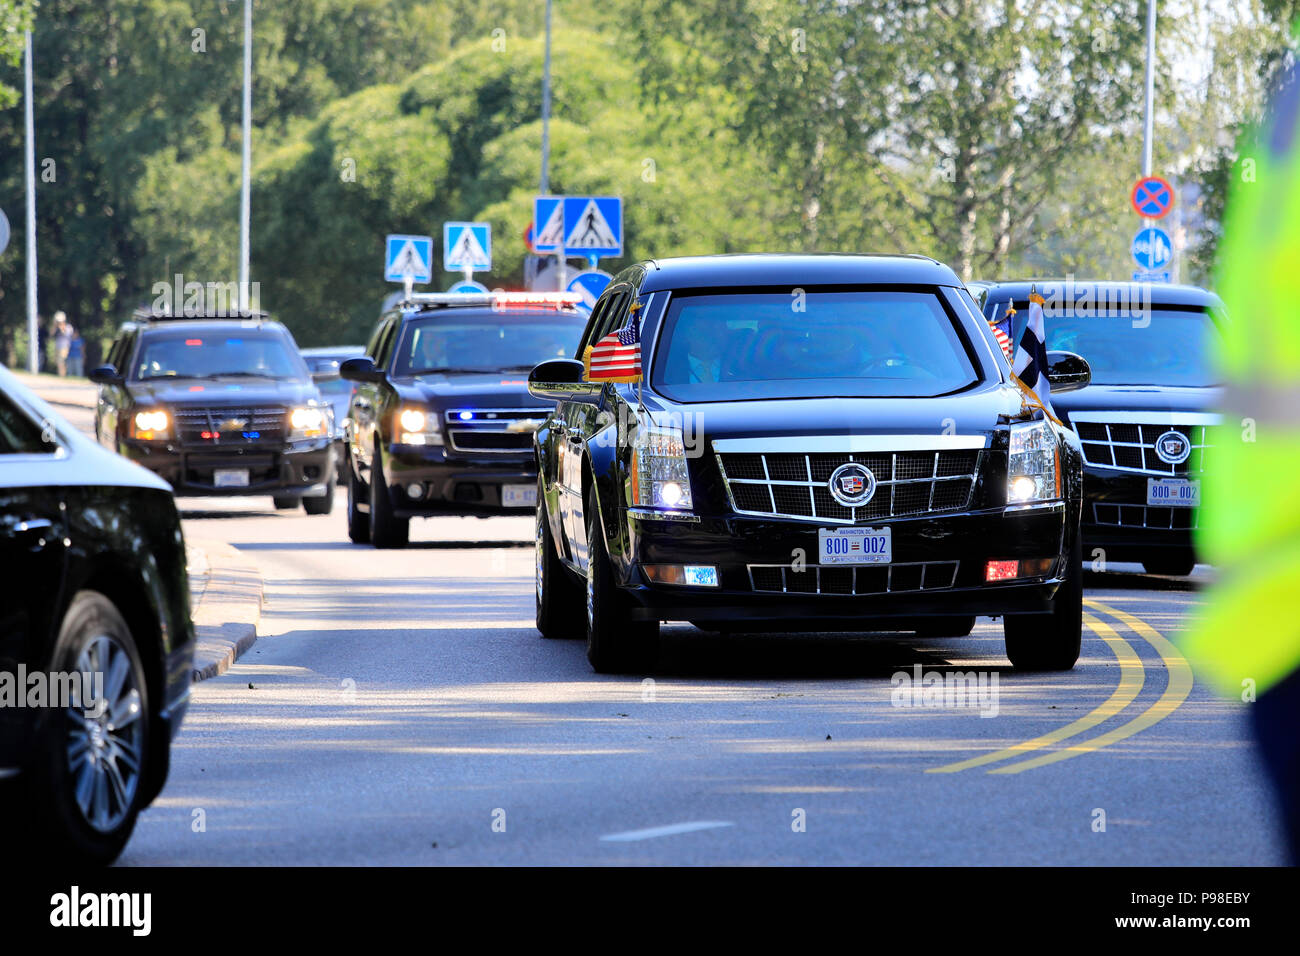 Helsinki, Finland. July 16, 2018. The motorcade of US President Donald Trump and First Lady Melania Trump passes along Ramsaynranta ahead of US and Russian Presidents' historic meeting. Credit: Taina Sohlman/Alamy Live News - Stock Image